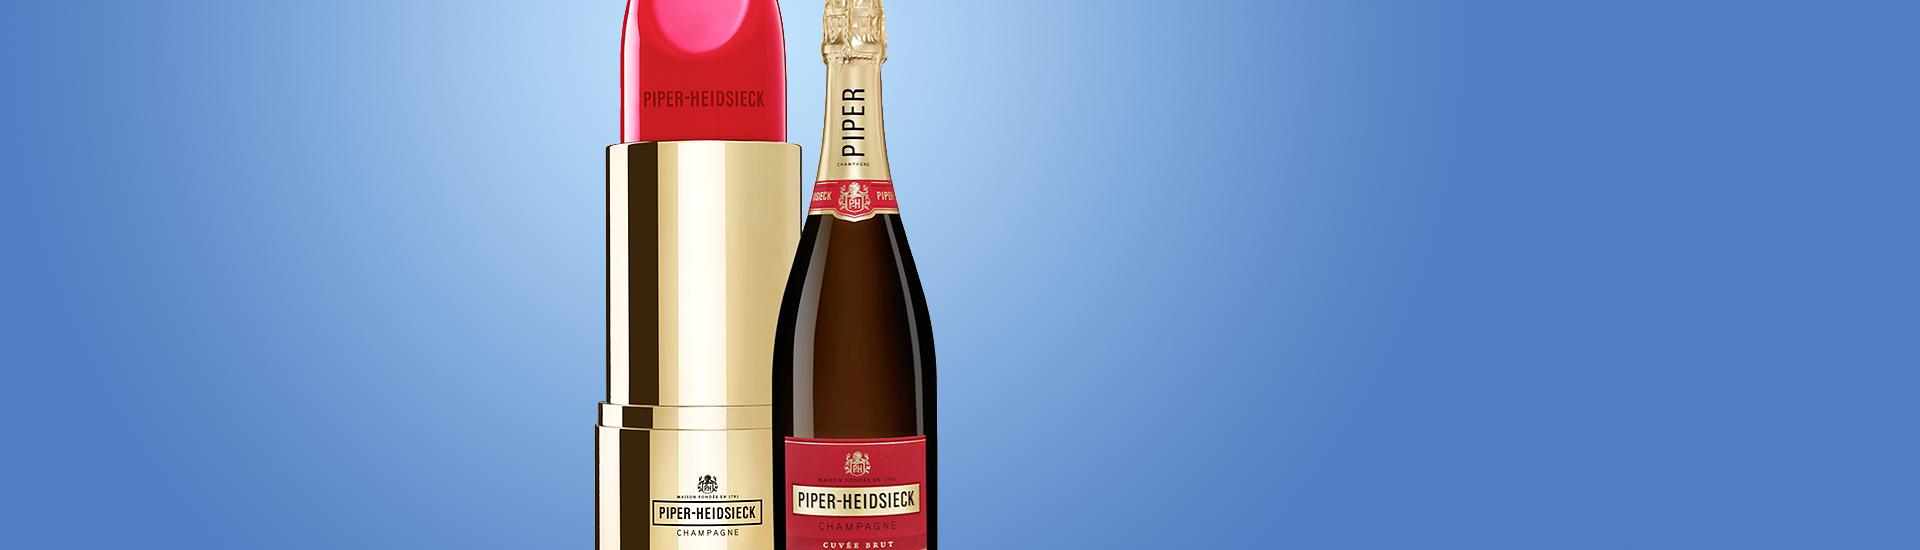 Piper-Heidsieck Brut Lipstick Edition - Champagne